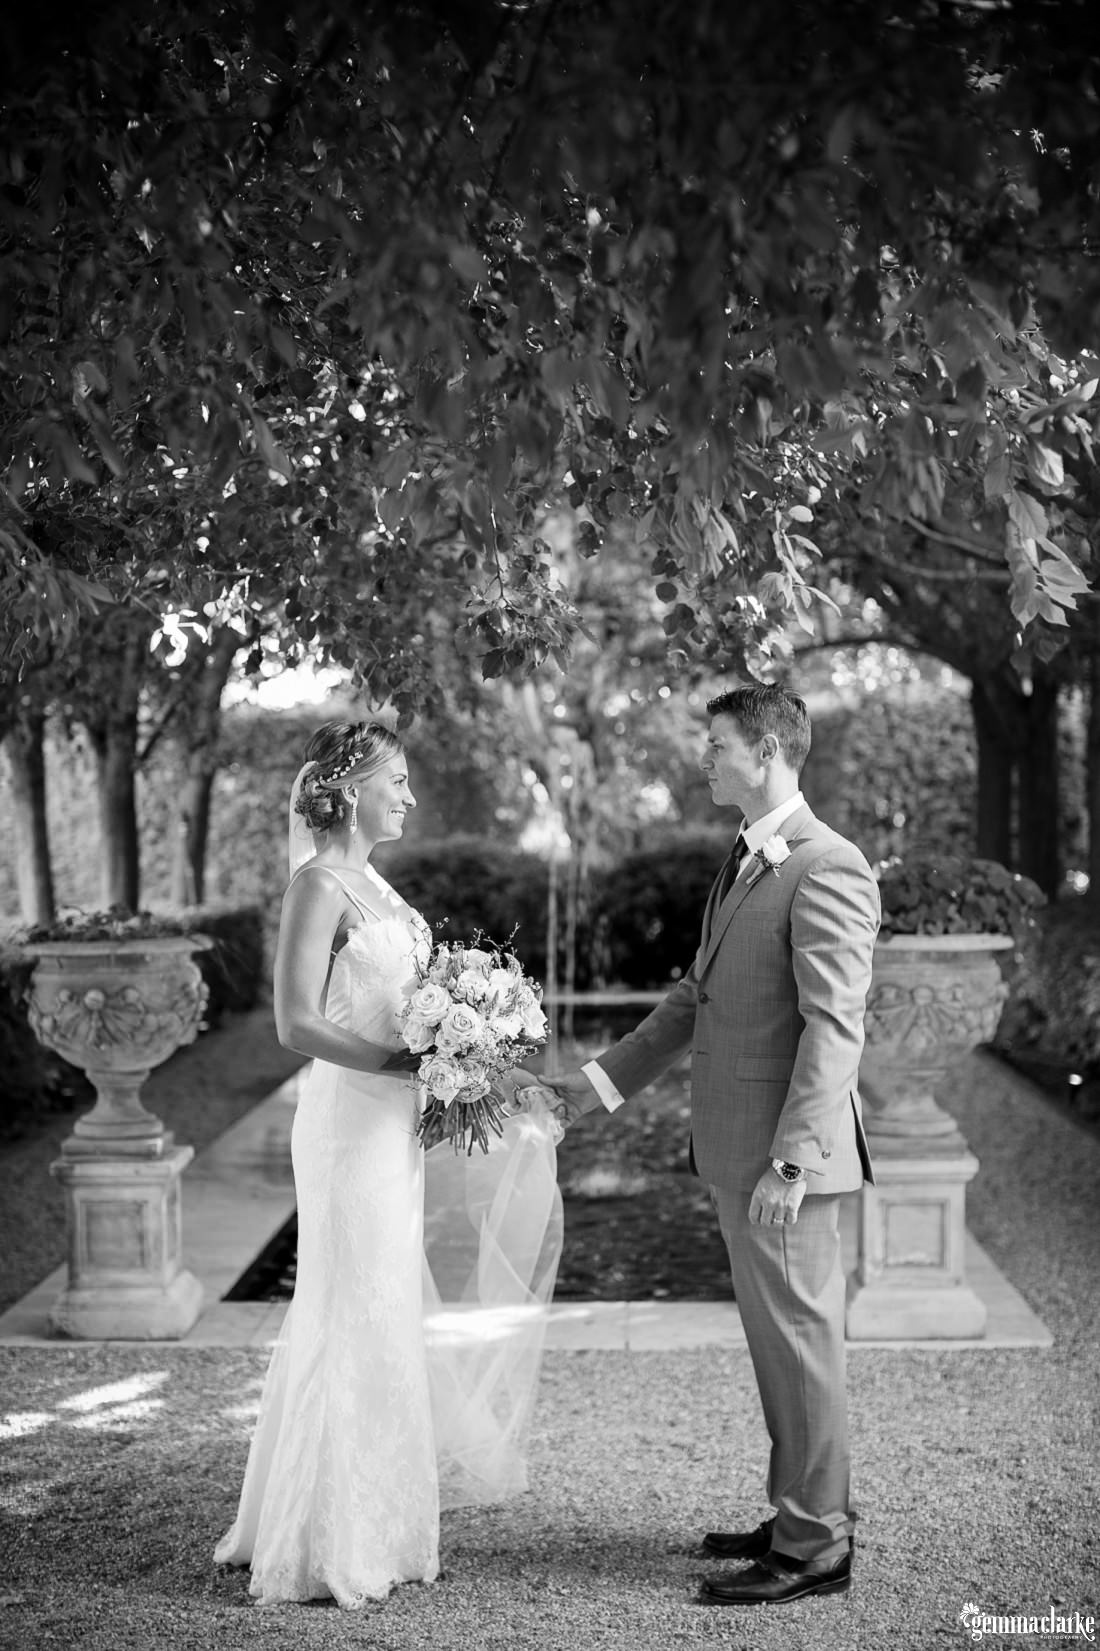 gemmaclarkephotography_jaspers-berry-wedding_south-coast-wedding_nikki-and-dan_0090